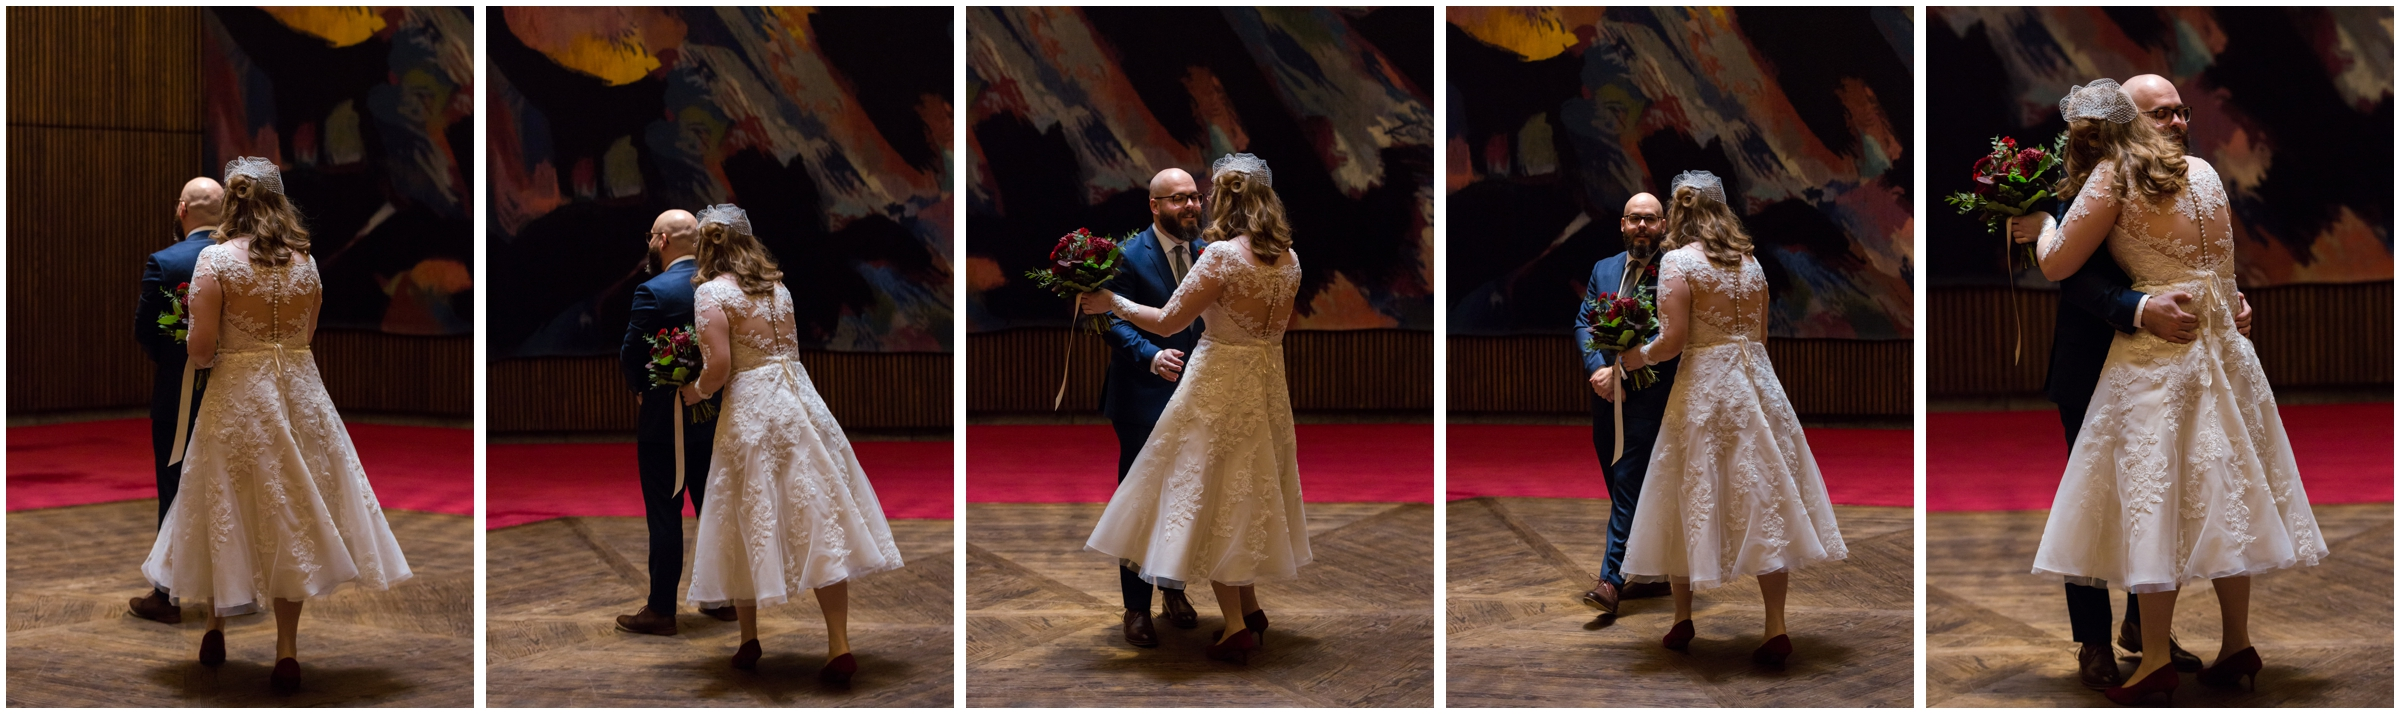 Ottaw Wedding Allison Andrew - (Selena Phillips-Boyle)_0025.jpg